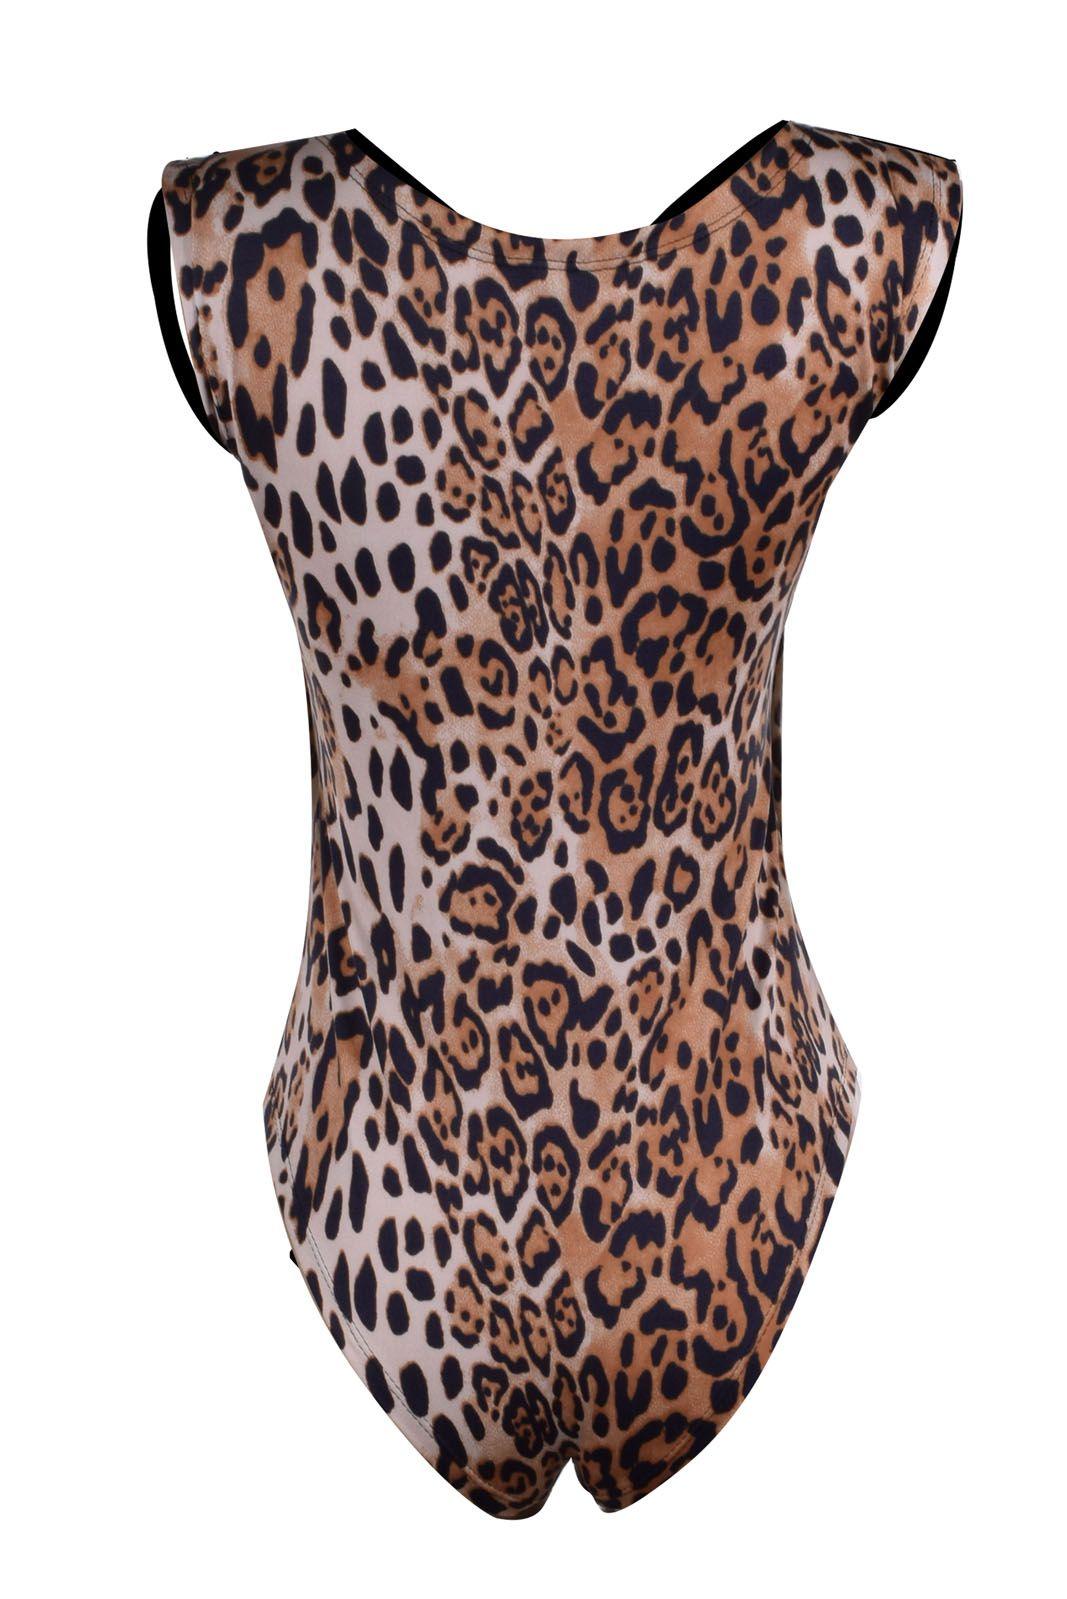 Body Outlet Dri Alça Grossa Suplex Tiras Teia Frontal Strass Animal Print Estampado Marrom